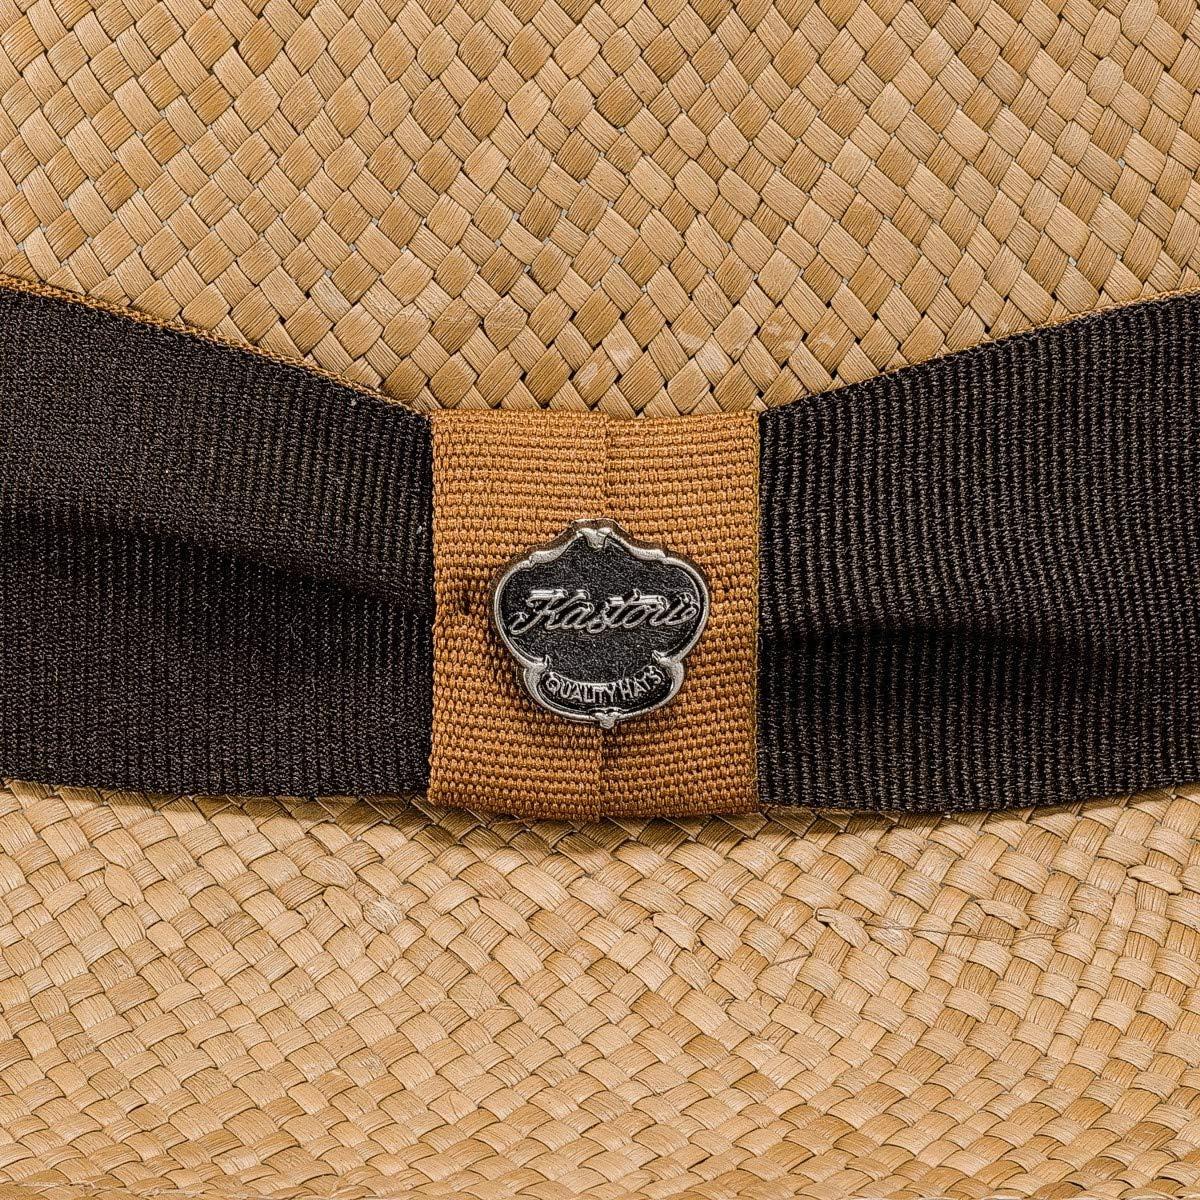 Kastori Silas Panamahut Straw Hat for Men and Women